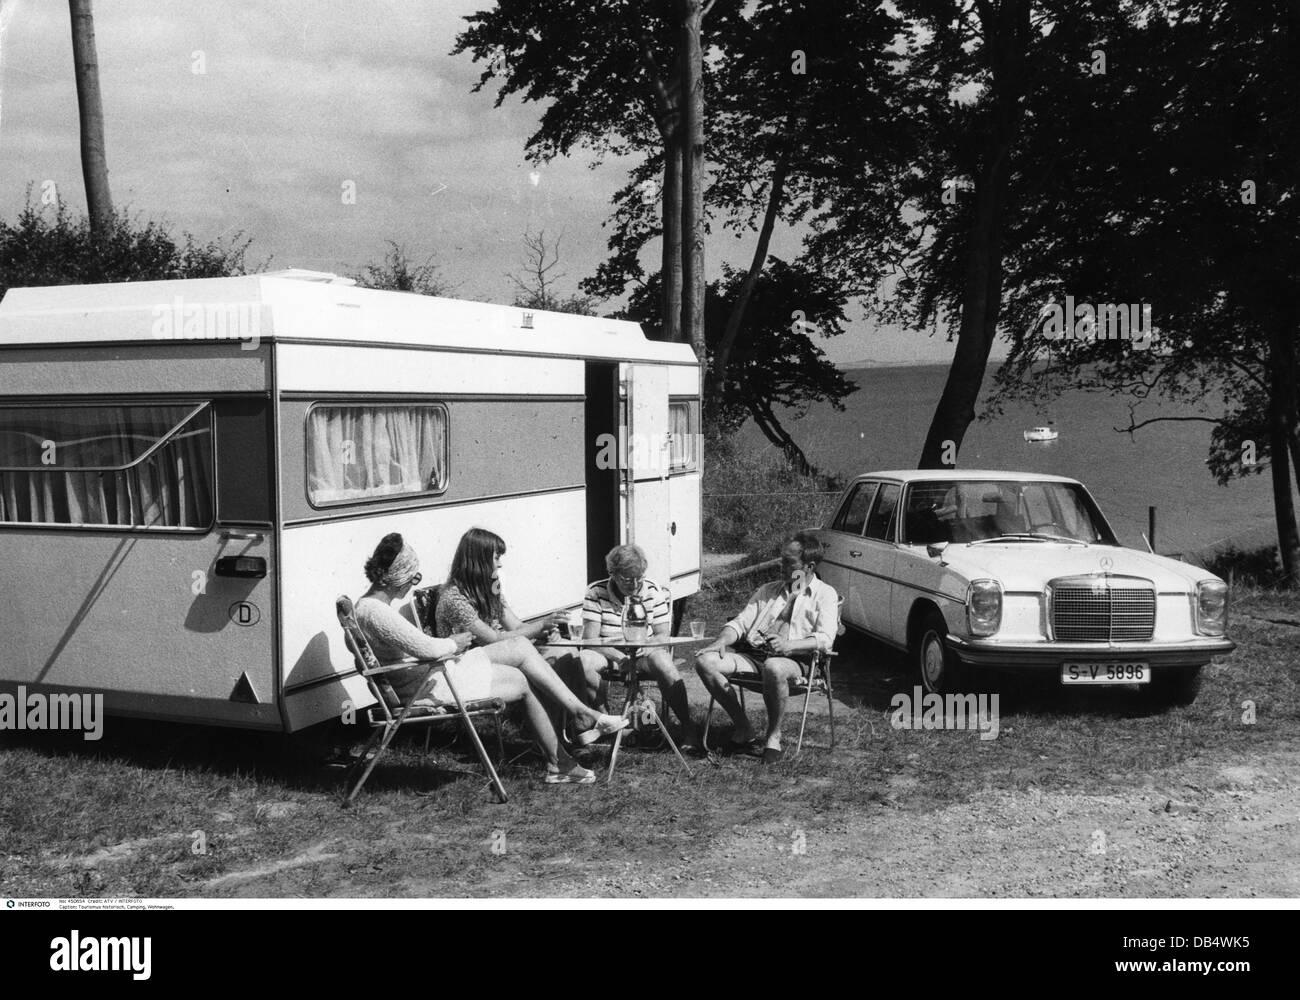 Fantastisch Camper Anhänger Verkabelung Ideen - Elektrische ...